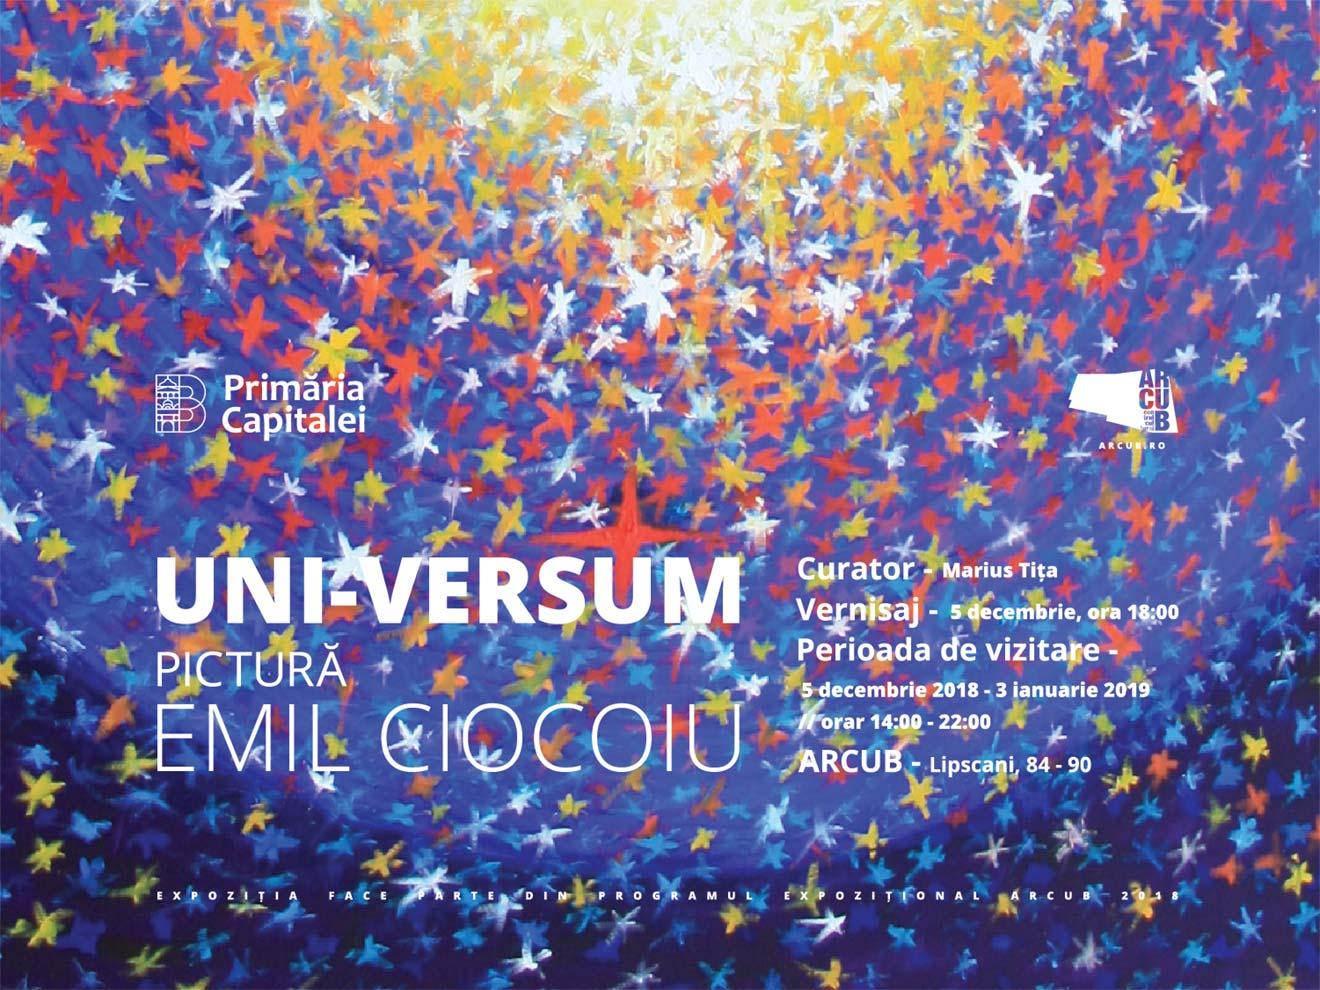 expozitia uni-versum - bucuresti centenar